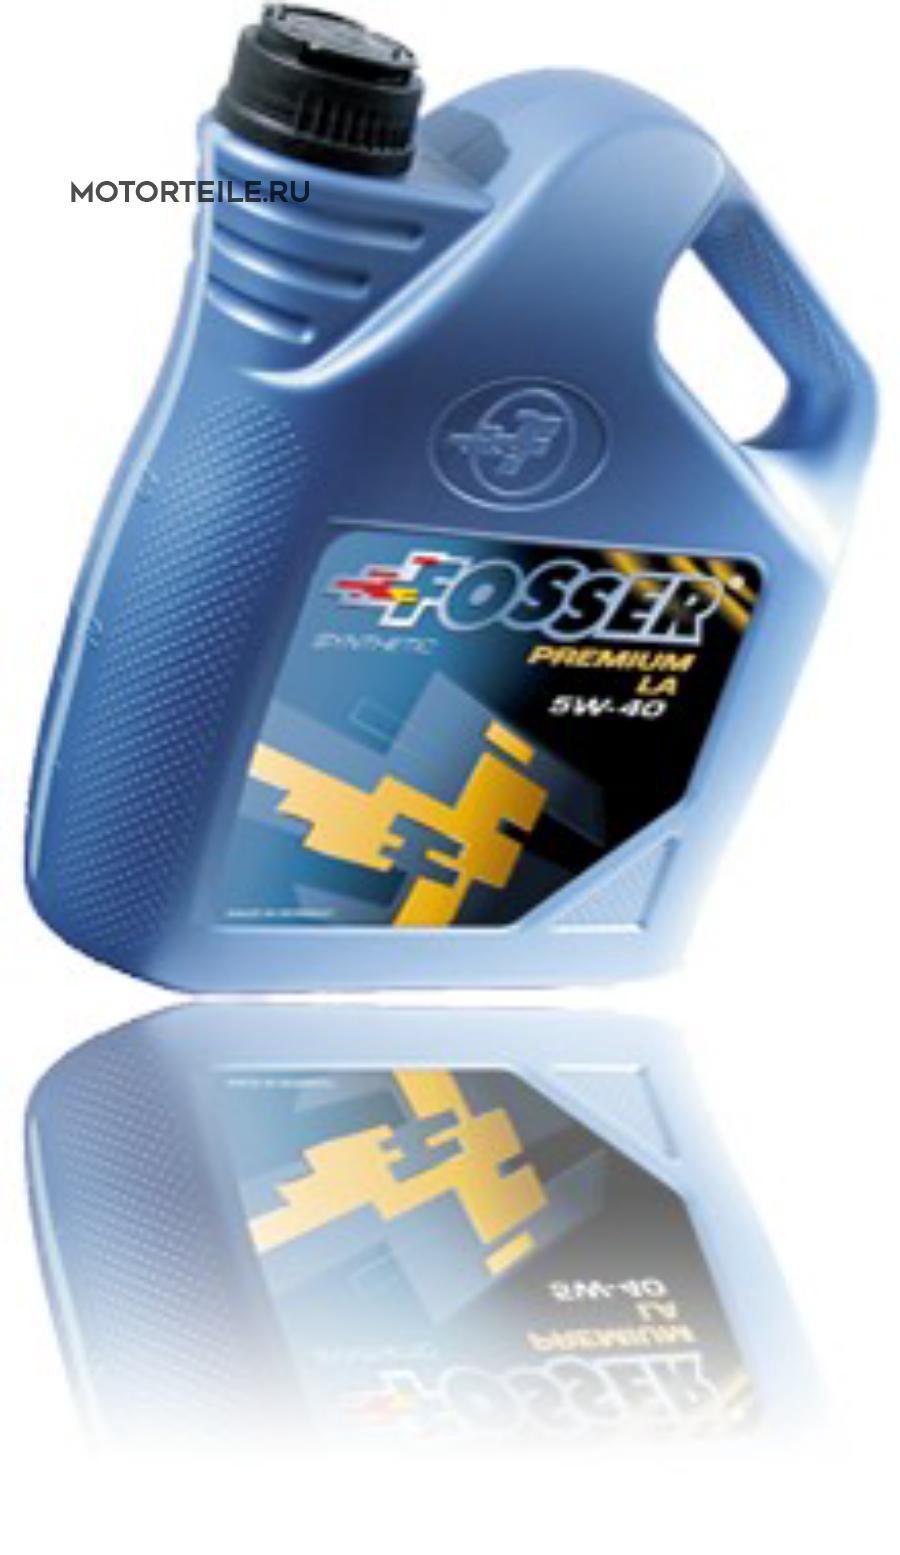 Масло моторное Fosser Premium LA 5W-40 (4л)